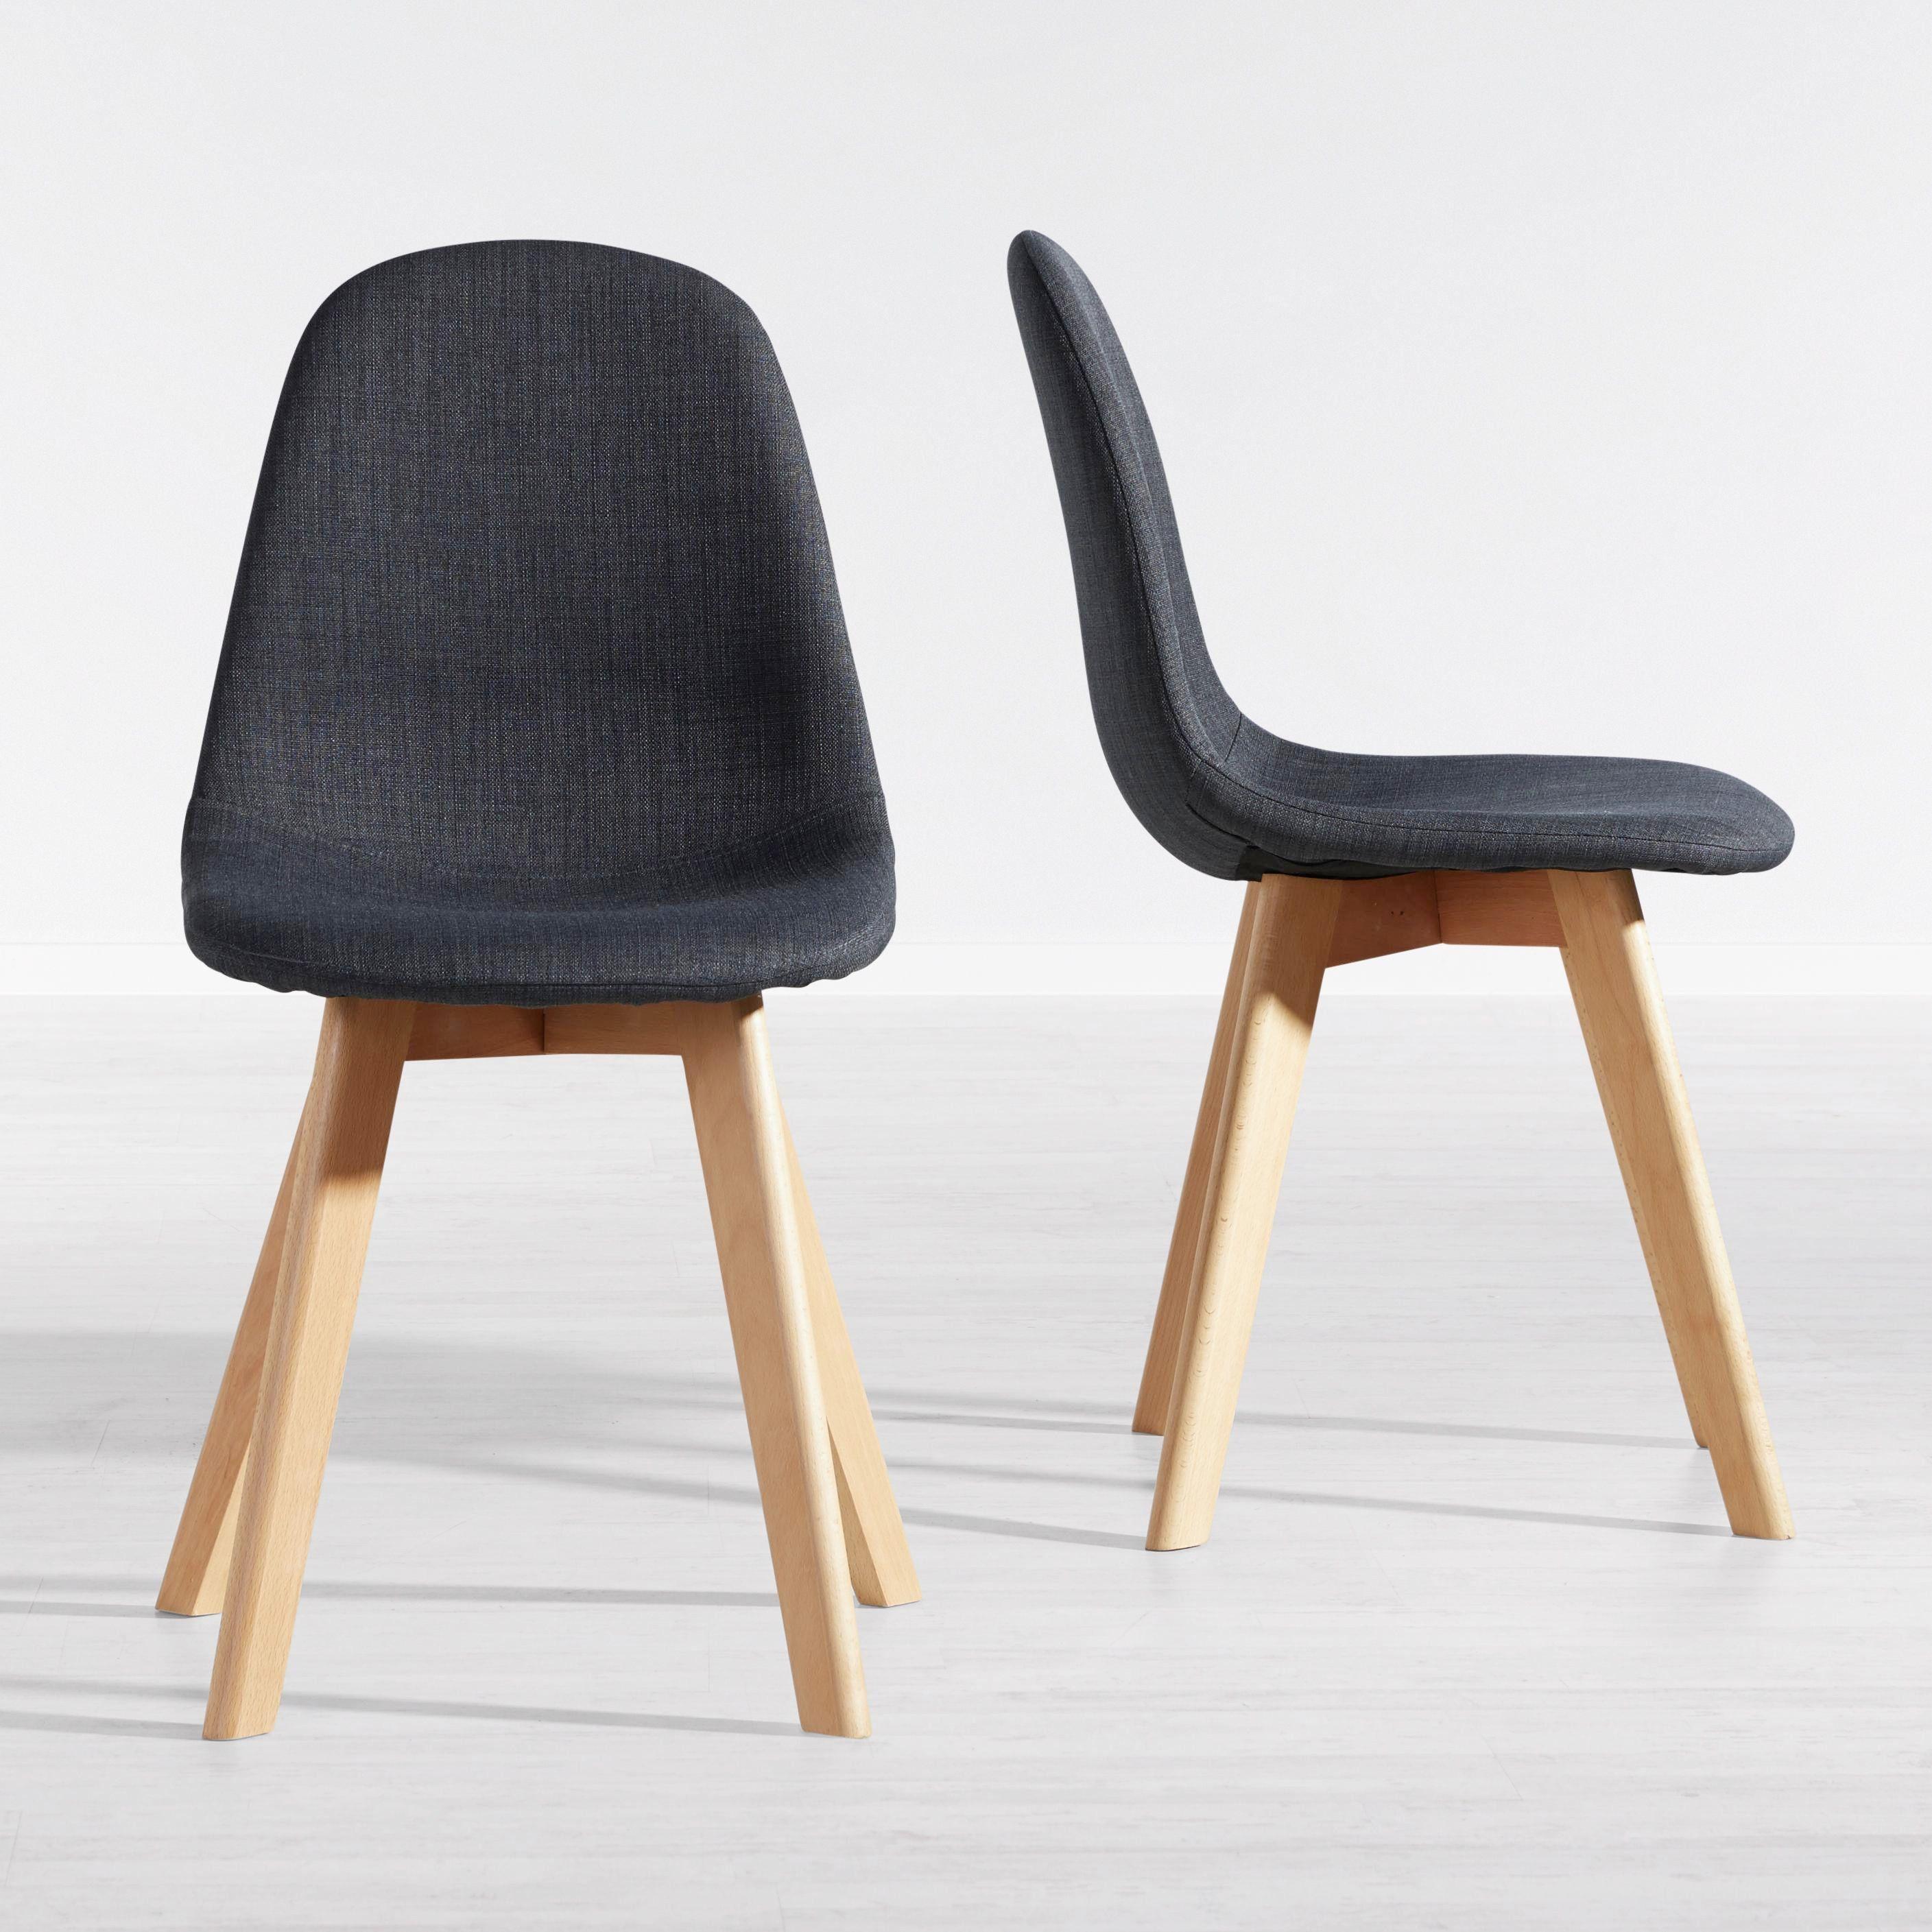 Stuhl Joelyna - Dunkelgrau/Buchefarben, MODERN, Holz/Textil (44/88/52cm) - Modern Living